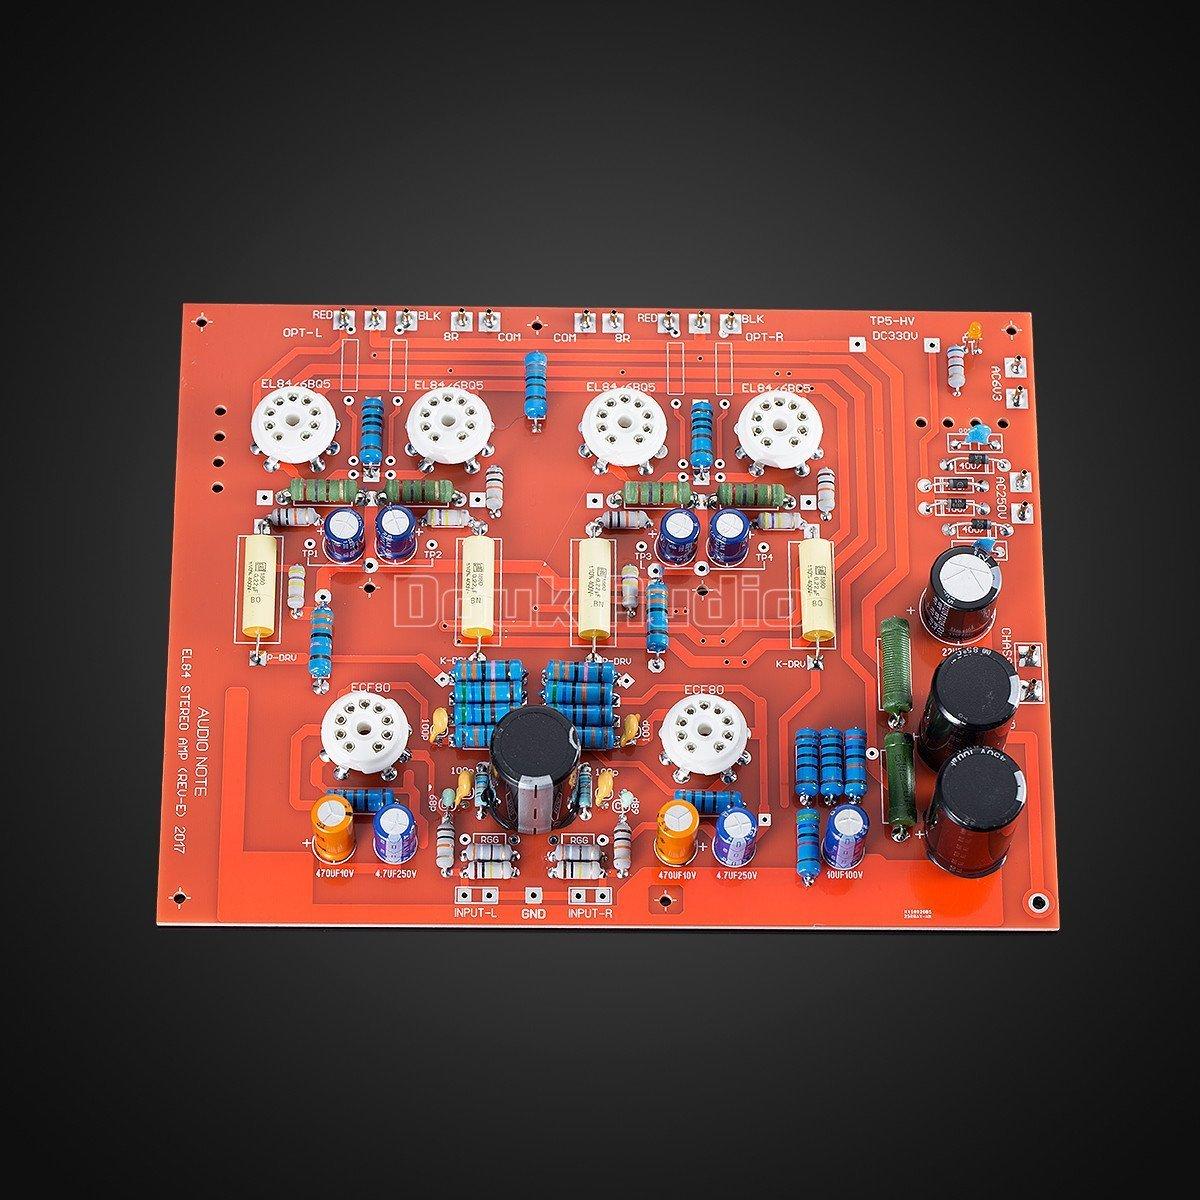 Nobsound Stereo Hi Fi Push Pull El84 Vaccum Tube Elektronik 10w 6l6 Amplifier